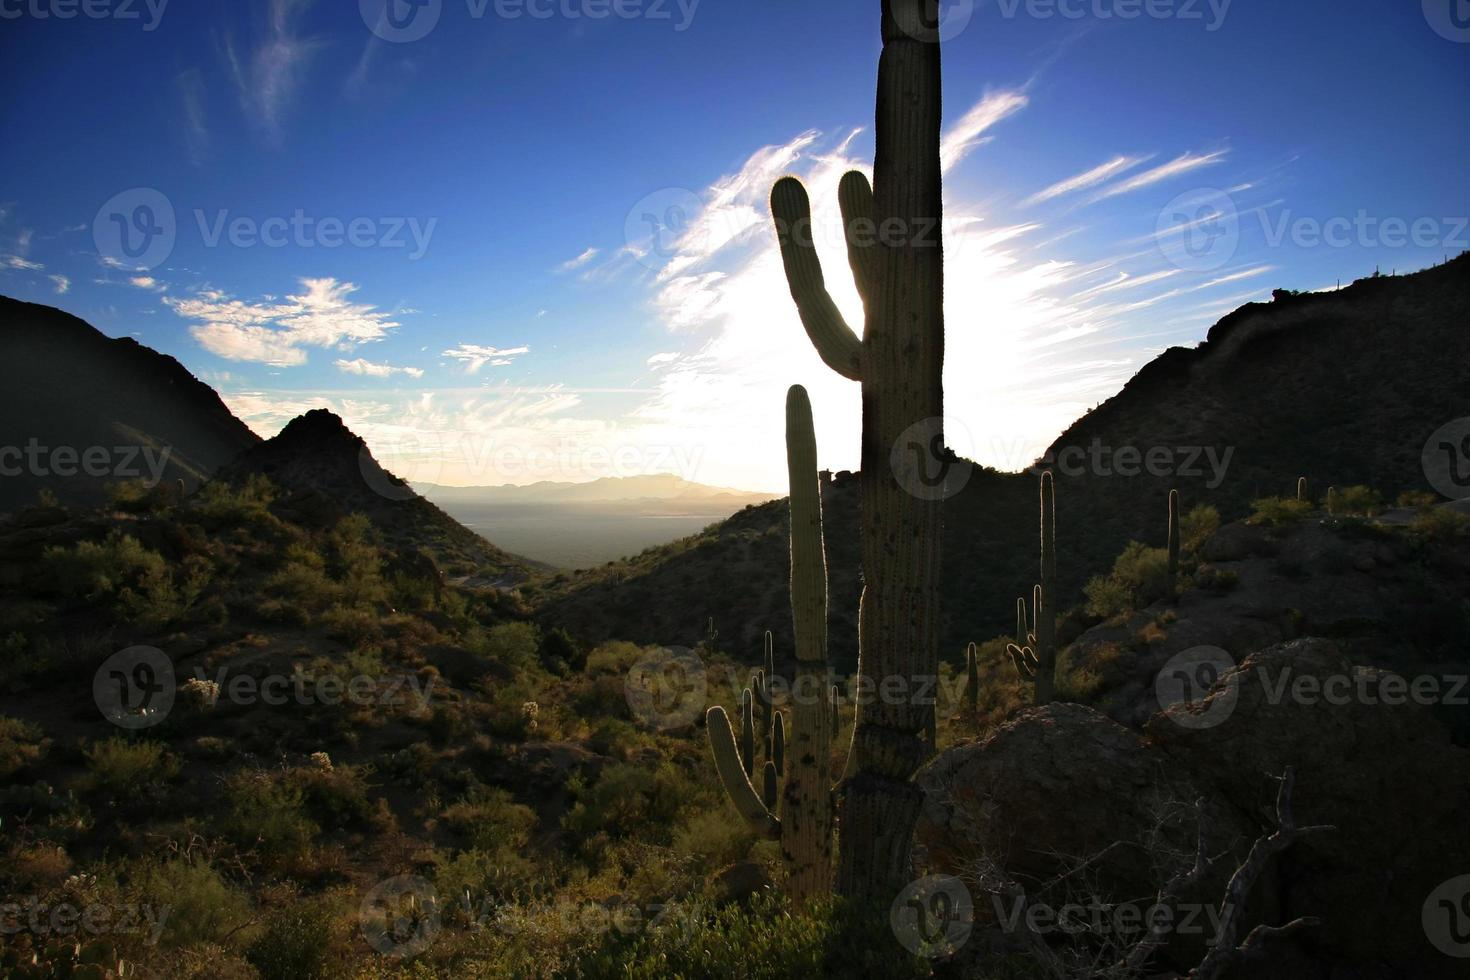 woestijn zonsondergang foto